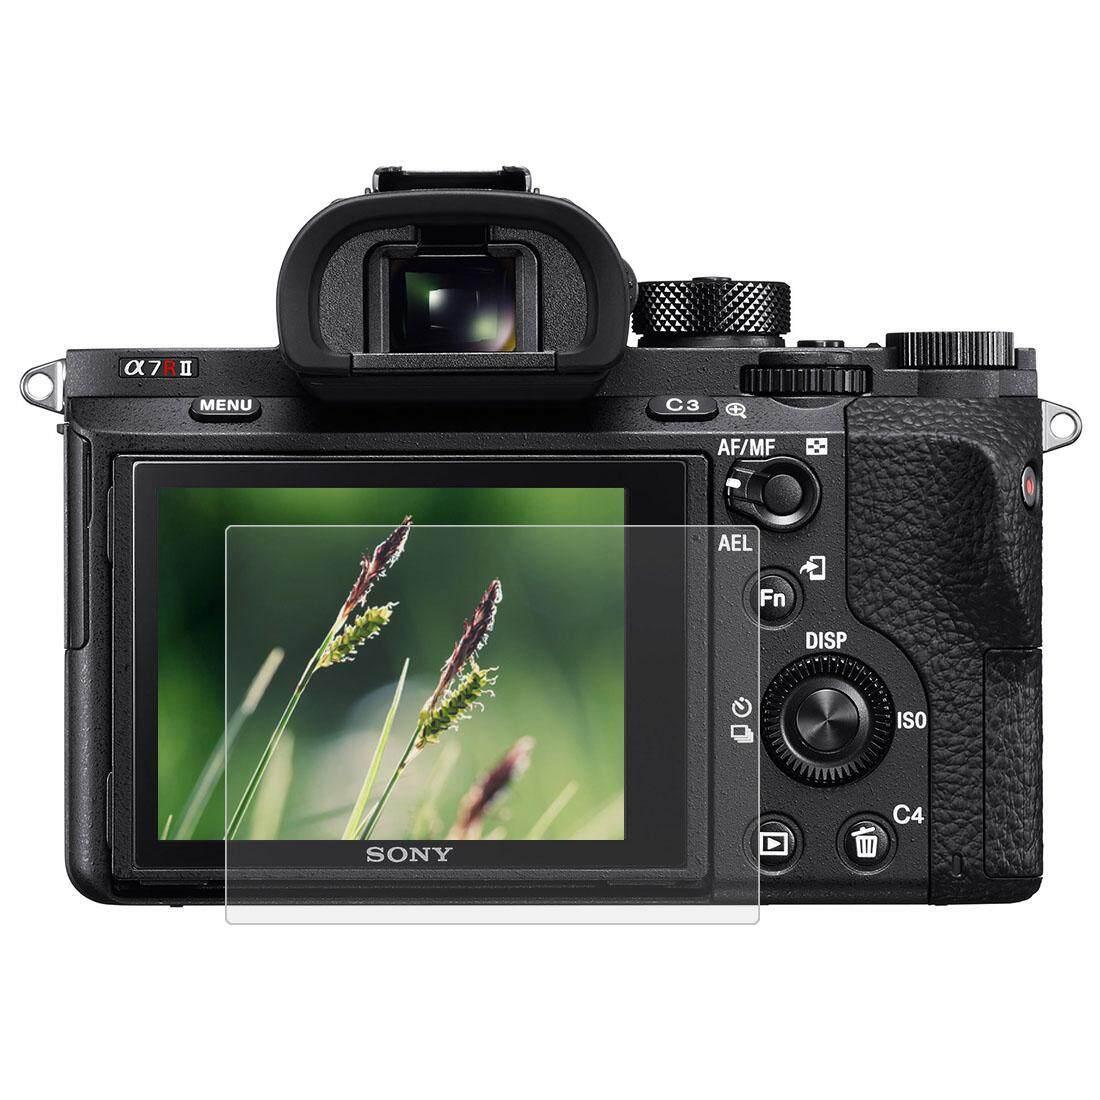 PU5510 0.3 Mm 9 H 2.5D Kaca Antigores Pelindung Layar Guard untuk Sony RX100 A7M2 A7R A7R2 Kamera